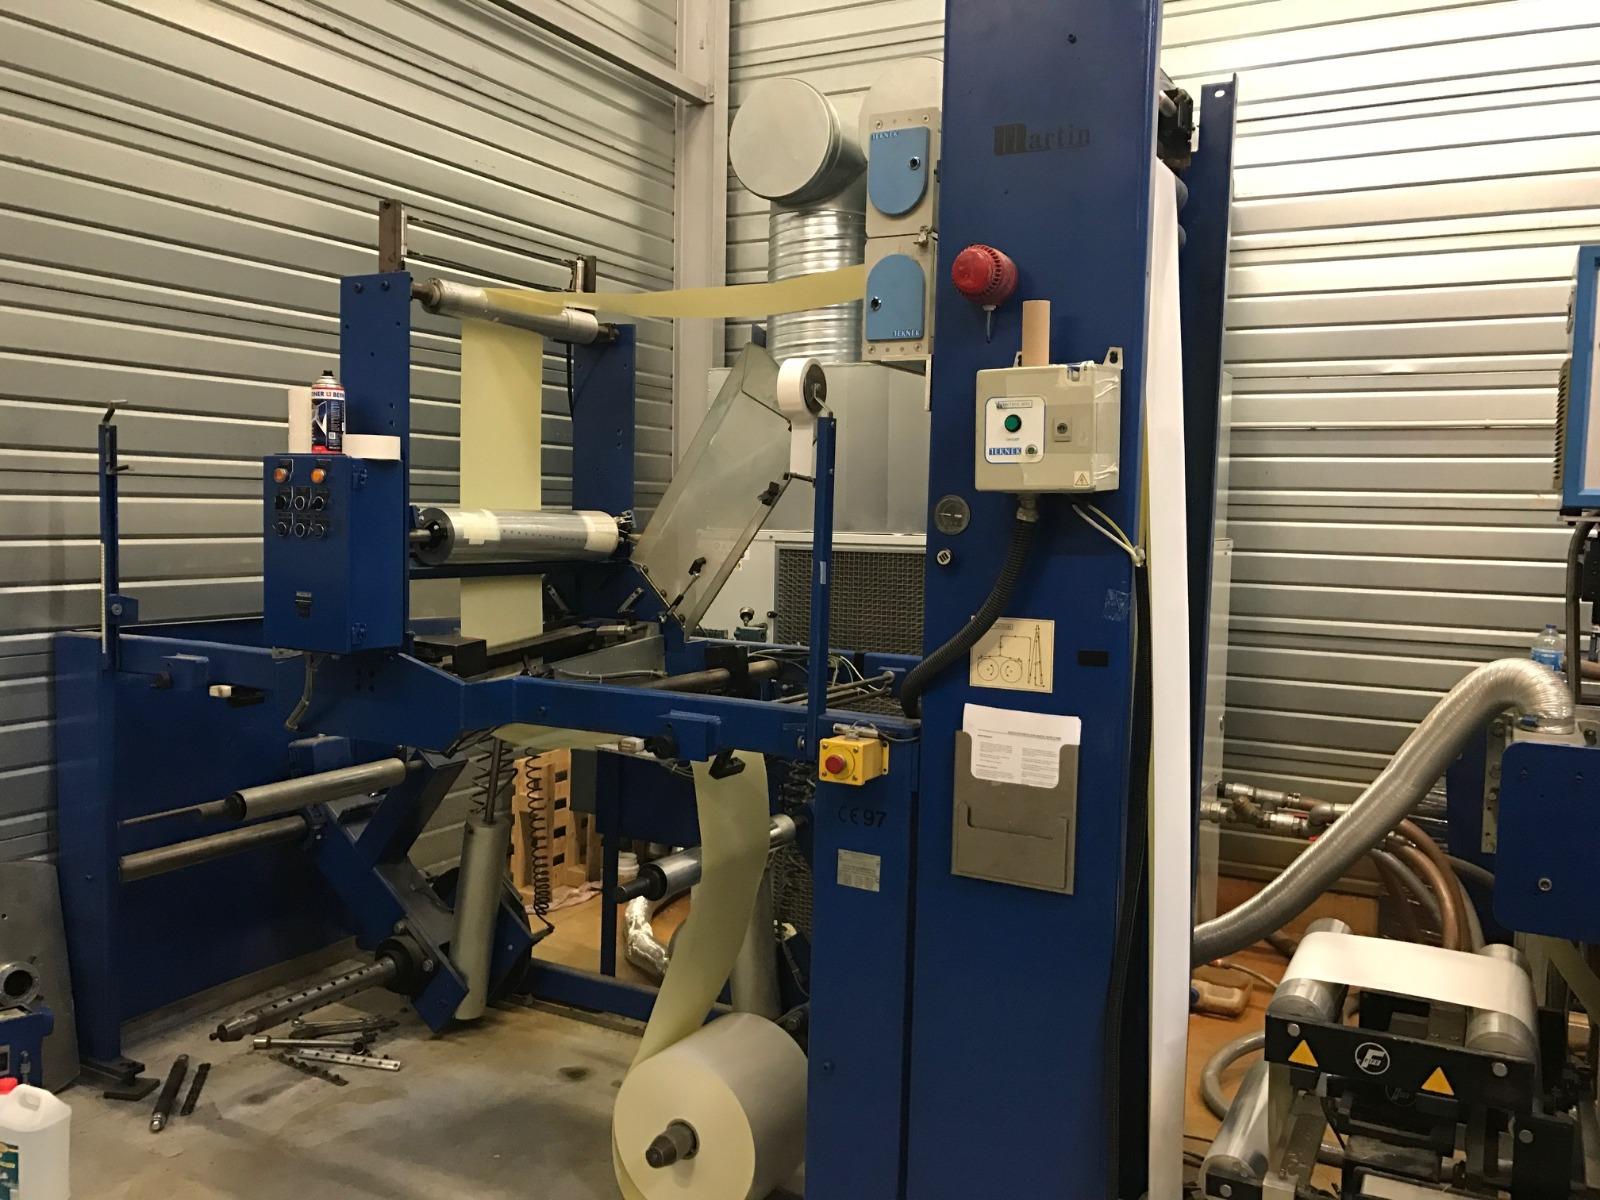 Gallus EM410 - Used Flexo Printing Presses and Used Flexographic Equipment-2